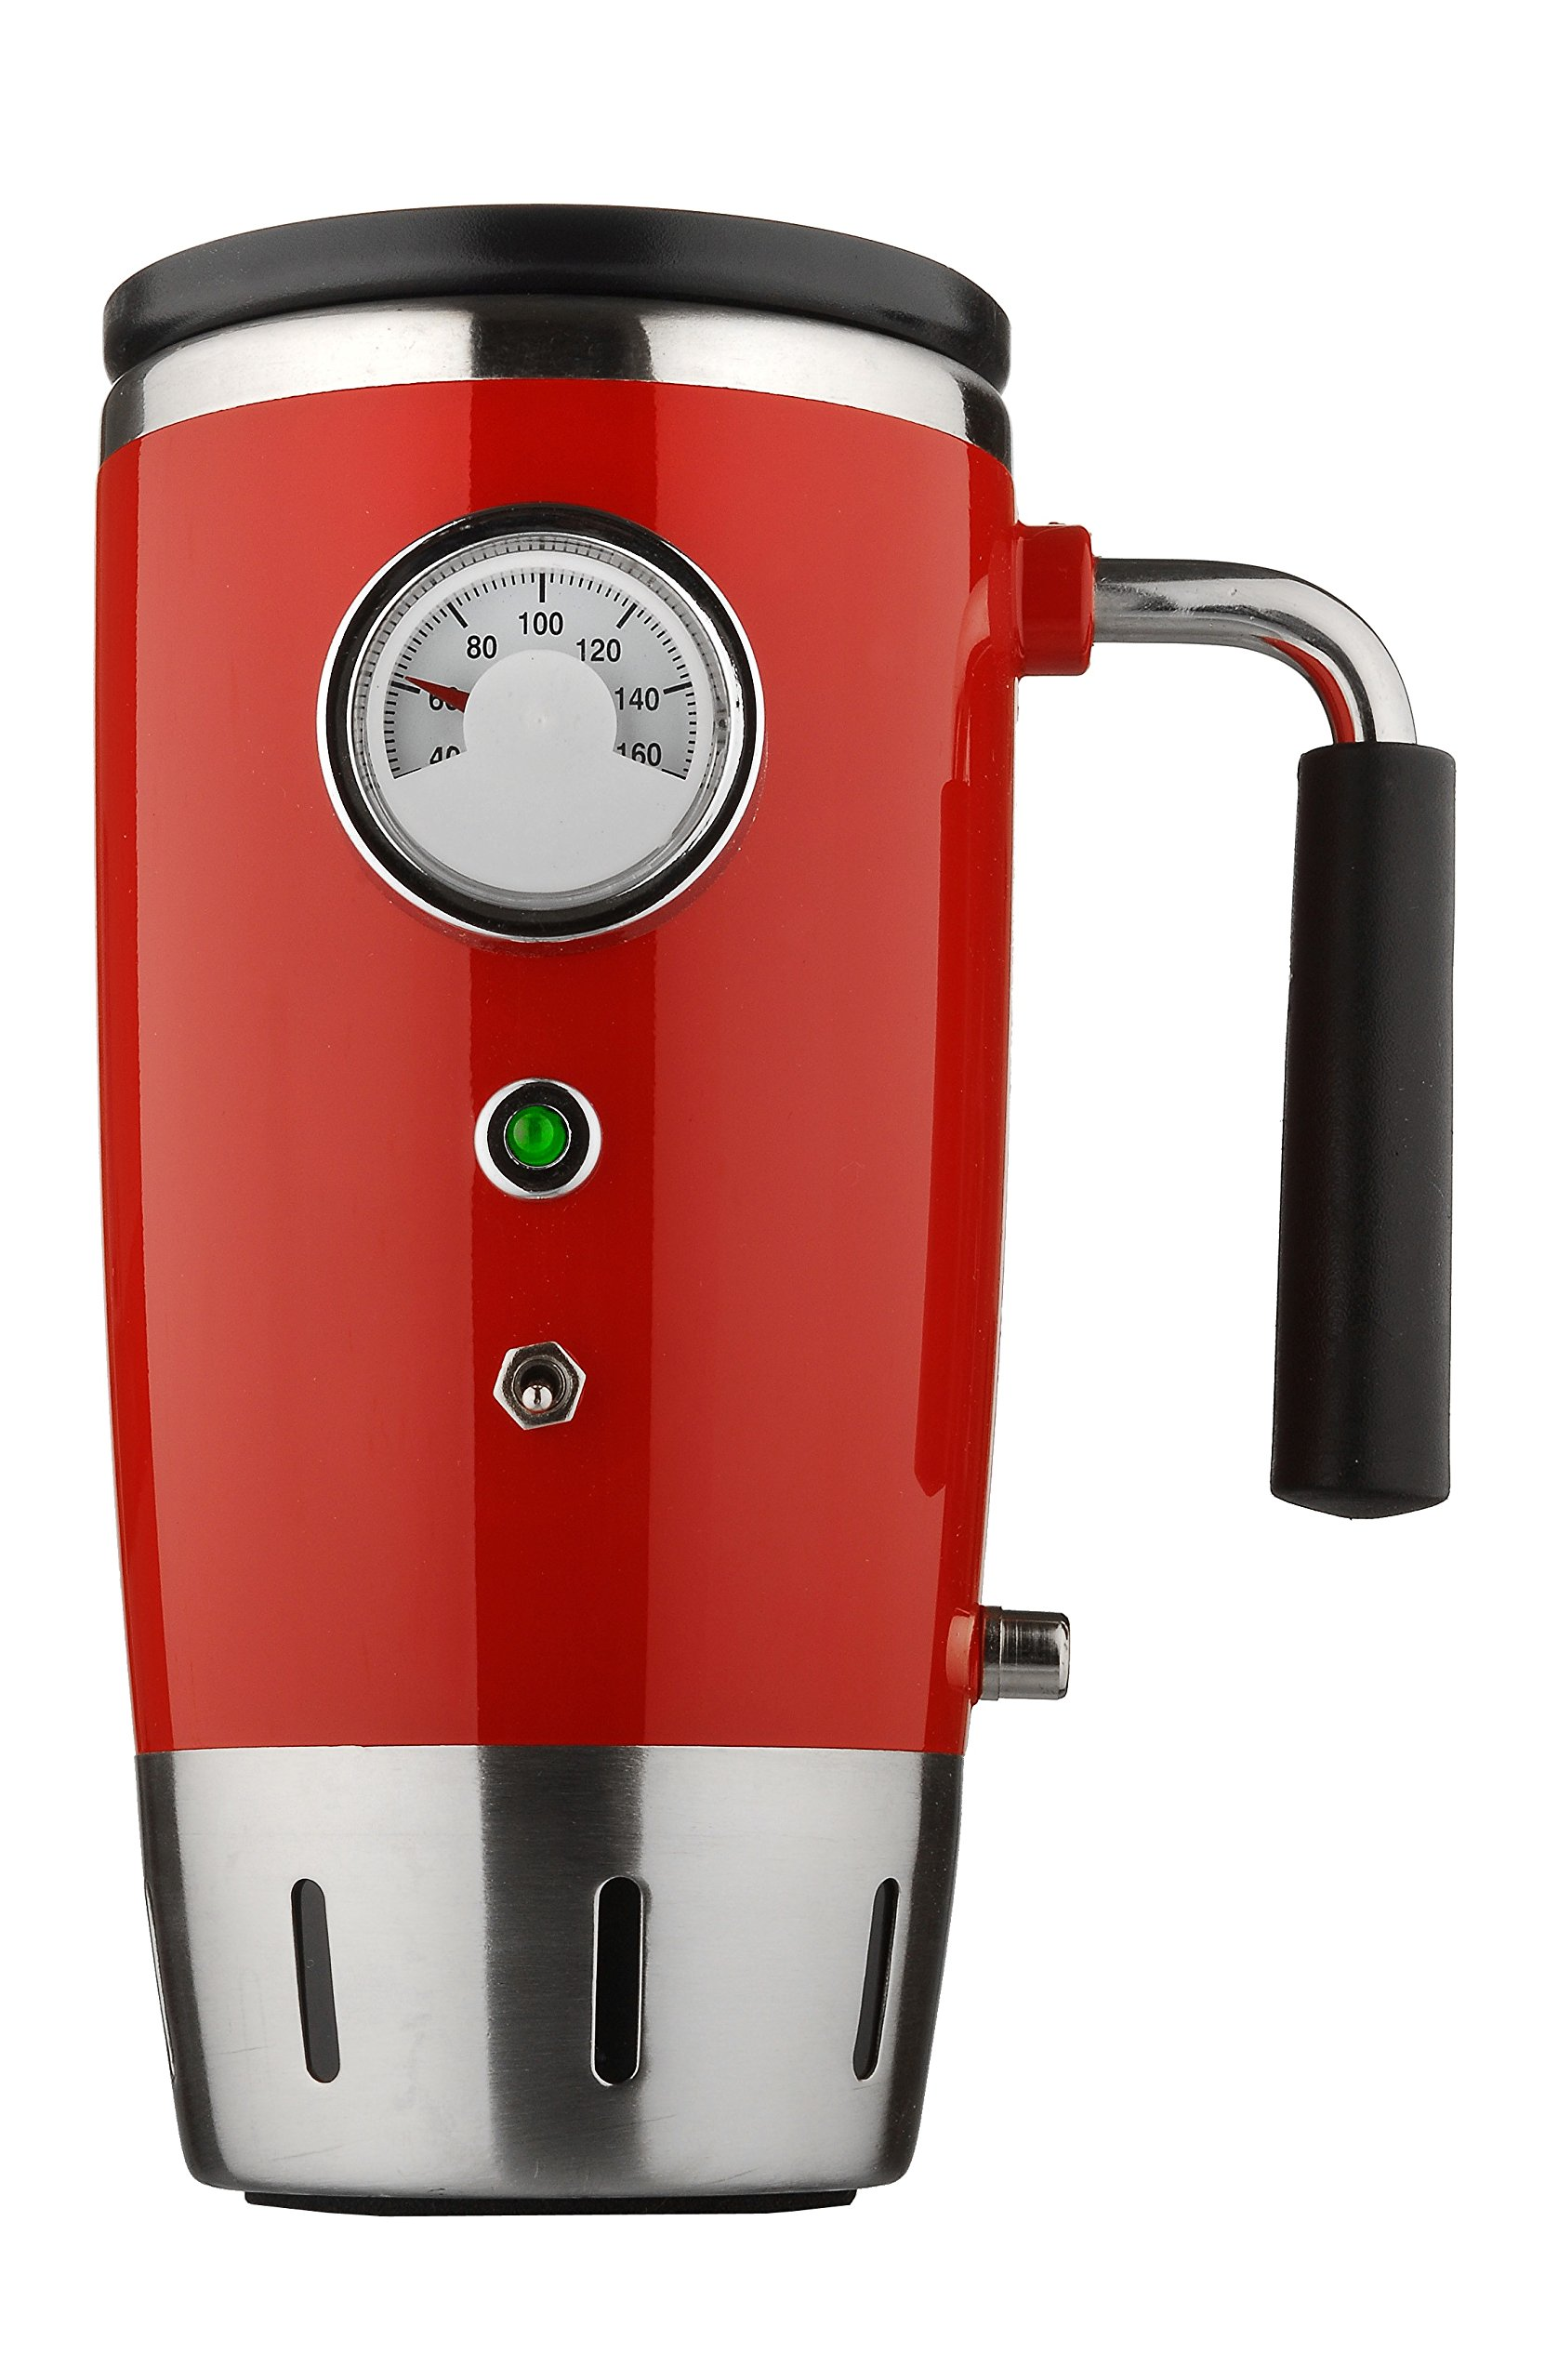 Tech Tools Retro Heated Smart Travel Mug Stainless Steel - 12V (Red)